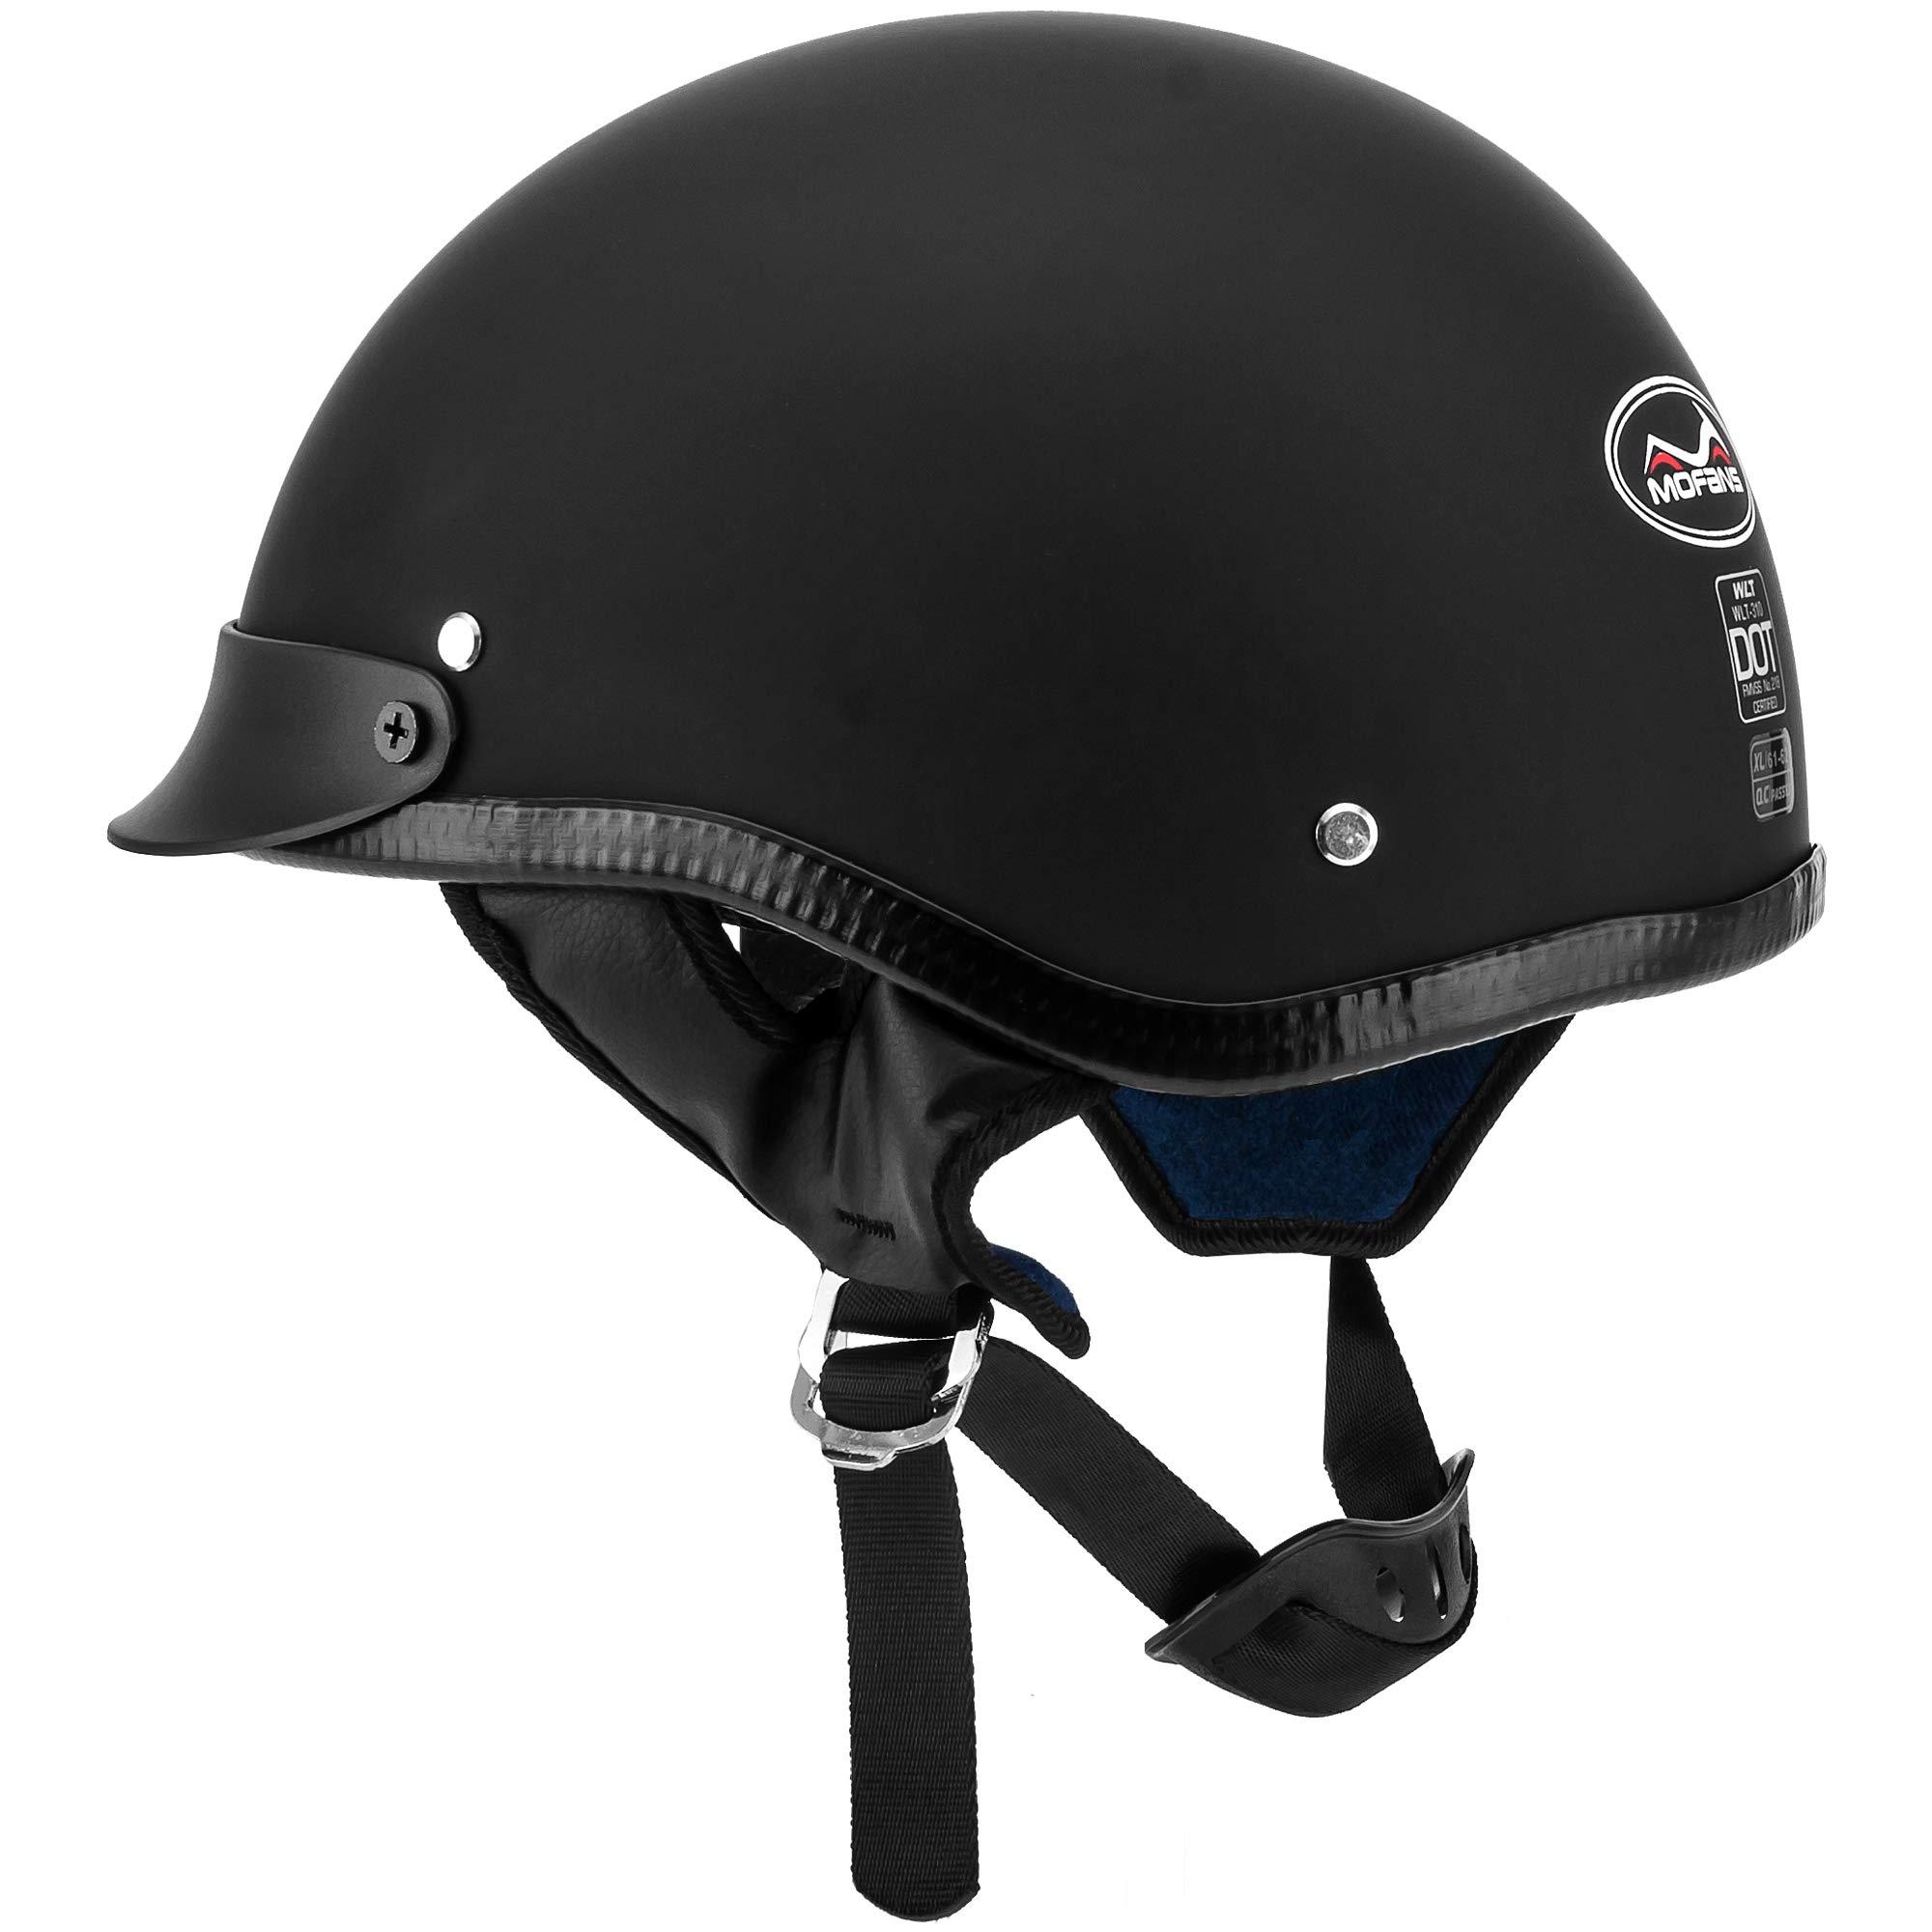 Vintage Half Motorcycle Helmet Fit for Bike Cruiser Scooter DOT Approved L by MotorFansClub